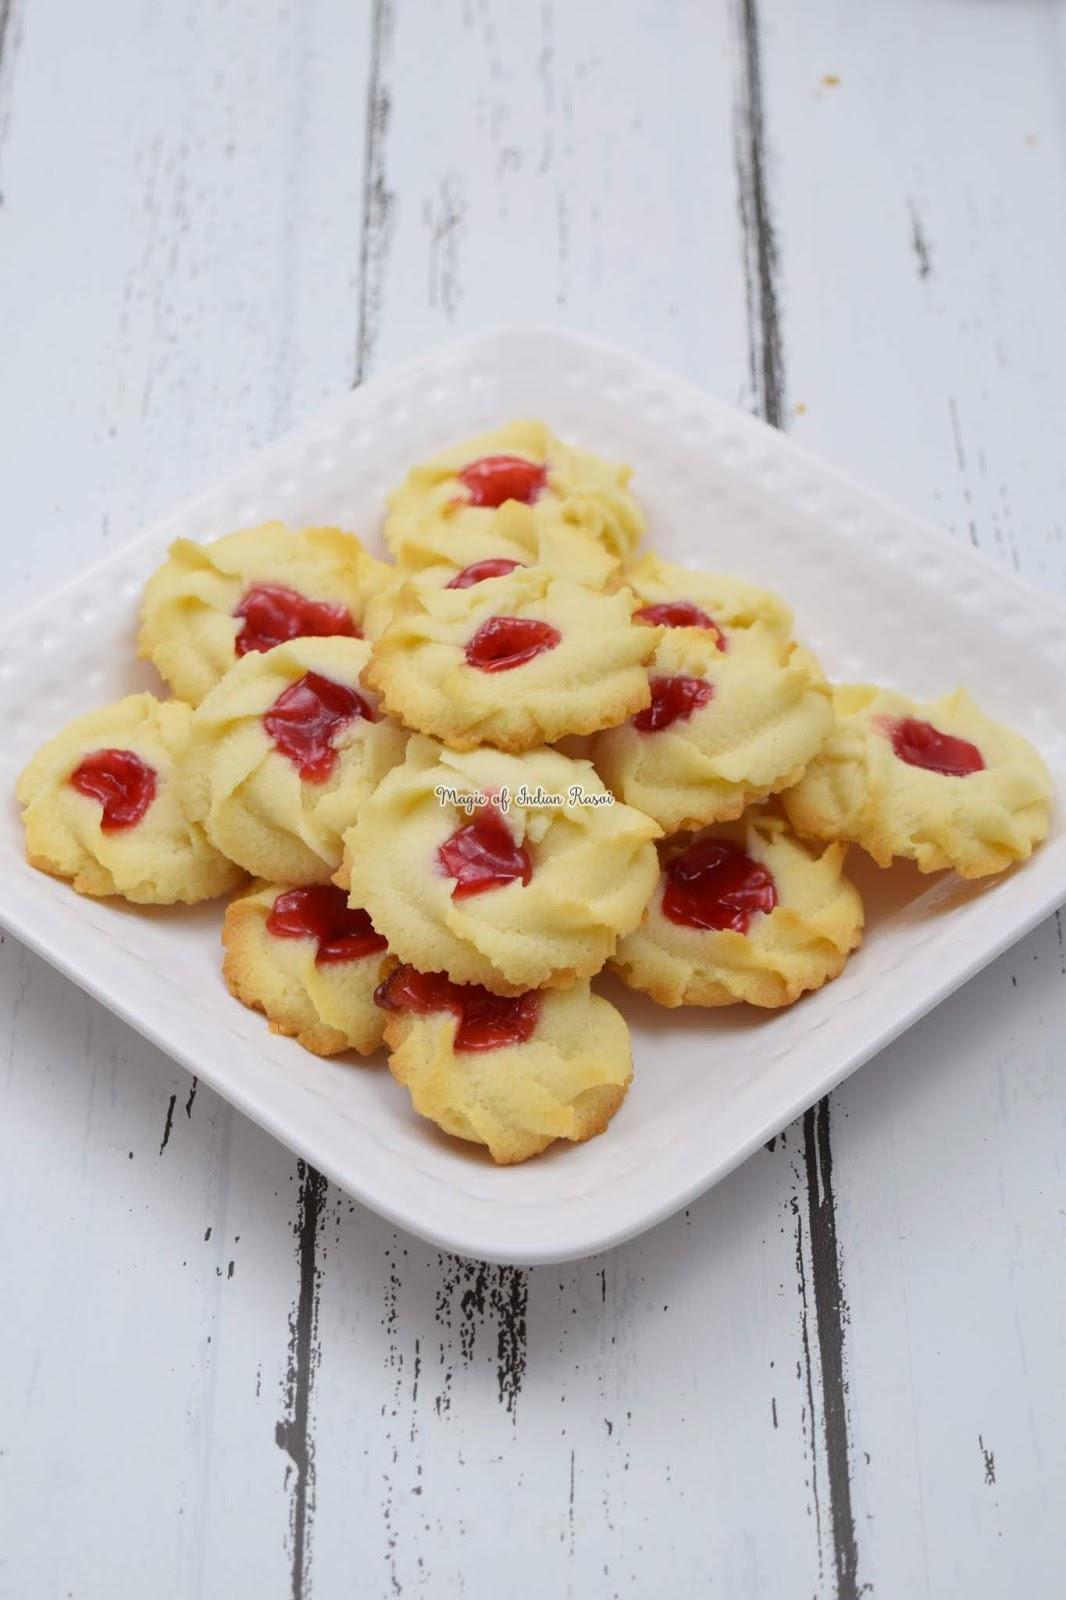 Bakery Style Piped Butter Cookies (Eggless)  - बेकरी जैसे एग्ग्लेस बटर बिस्किट्स  - Priya R - Magic of Indian Rasoi